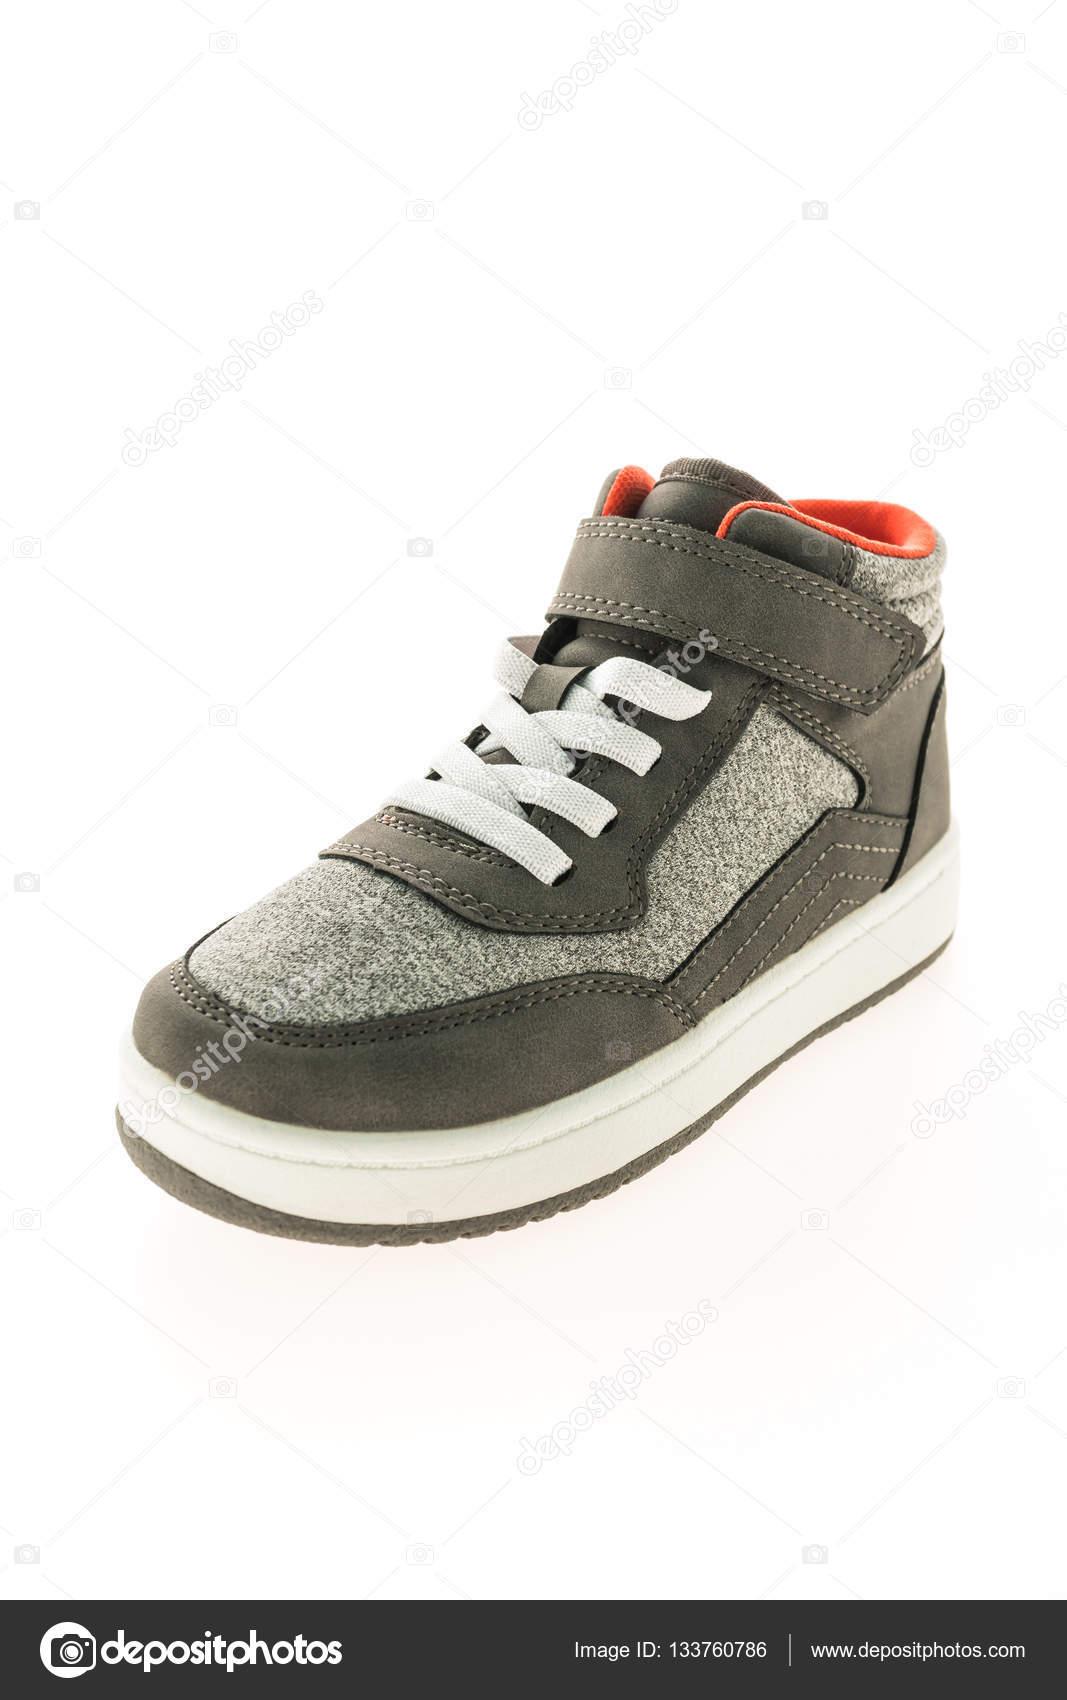 71fa21f2931 Μόδα παπούτσια και αθλητικά — Φωτογραφία Αρχείου © mrsiraphol #133760786